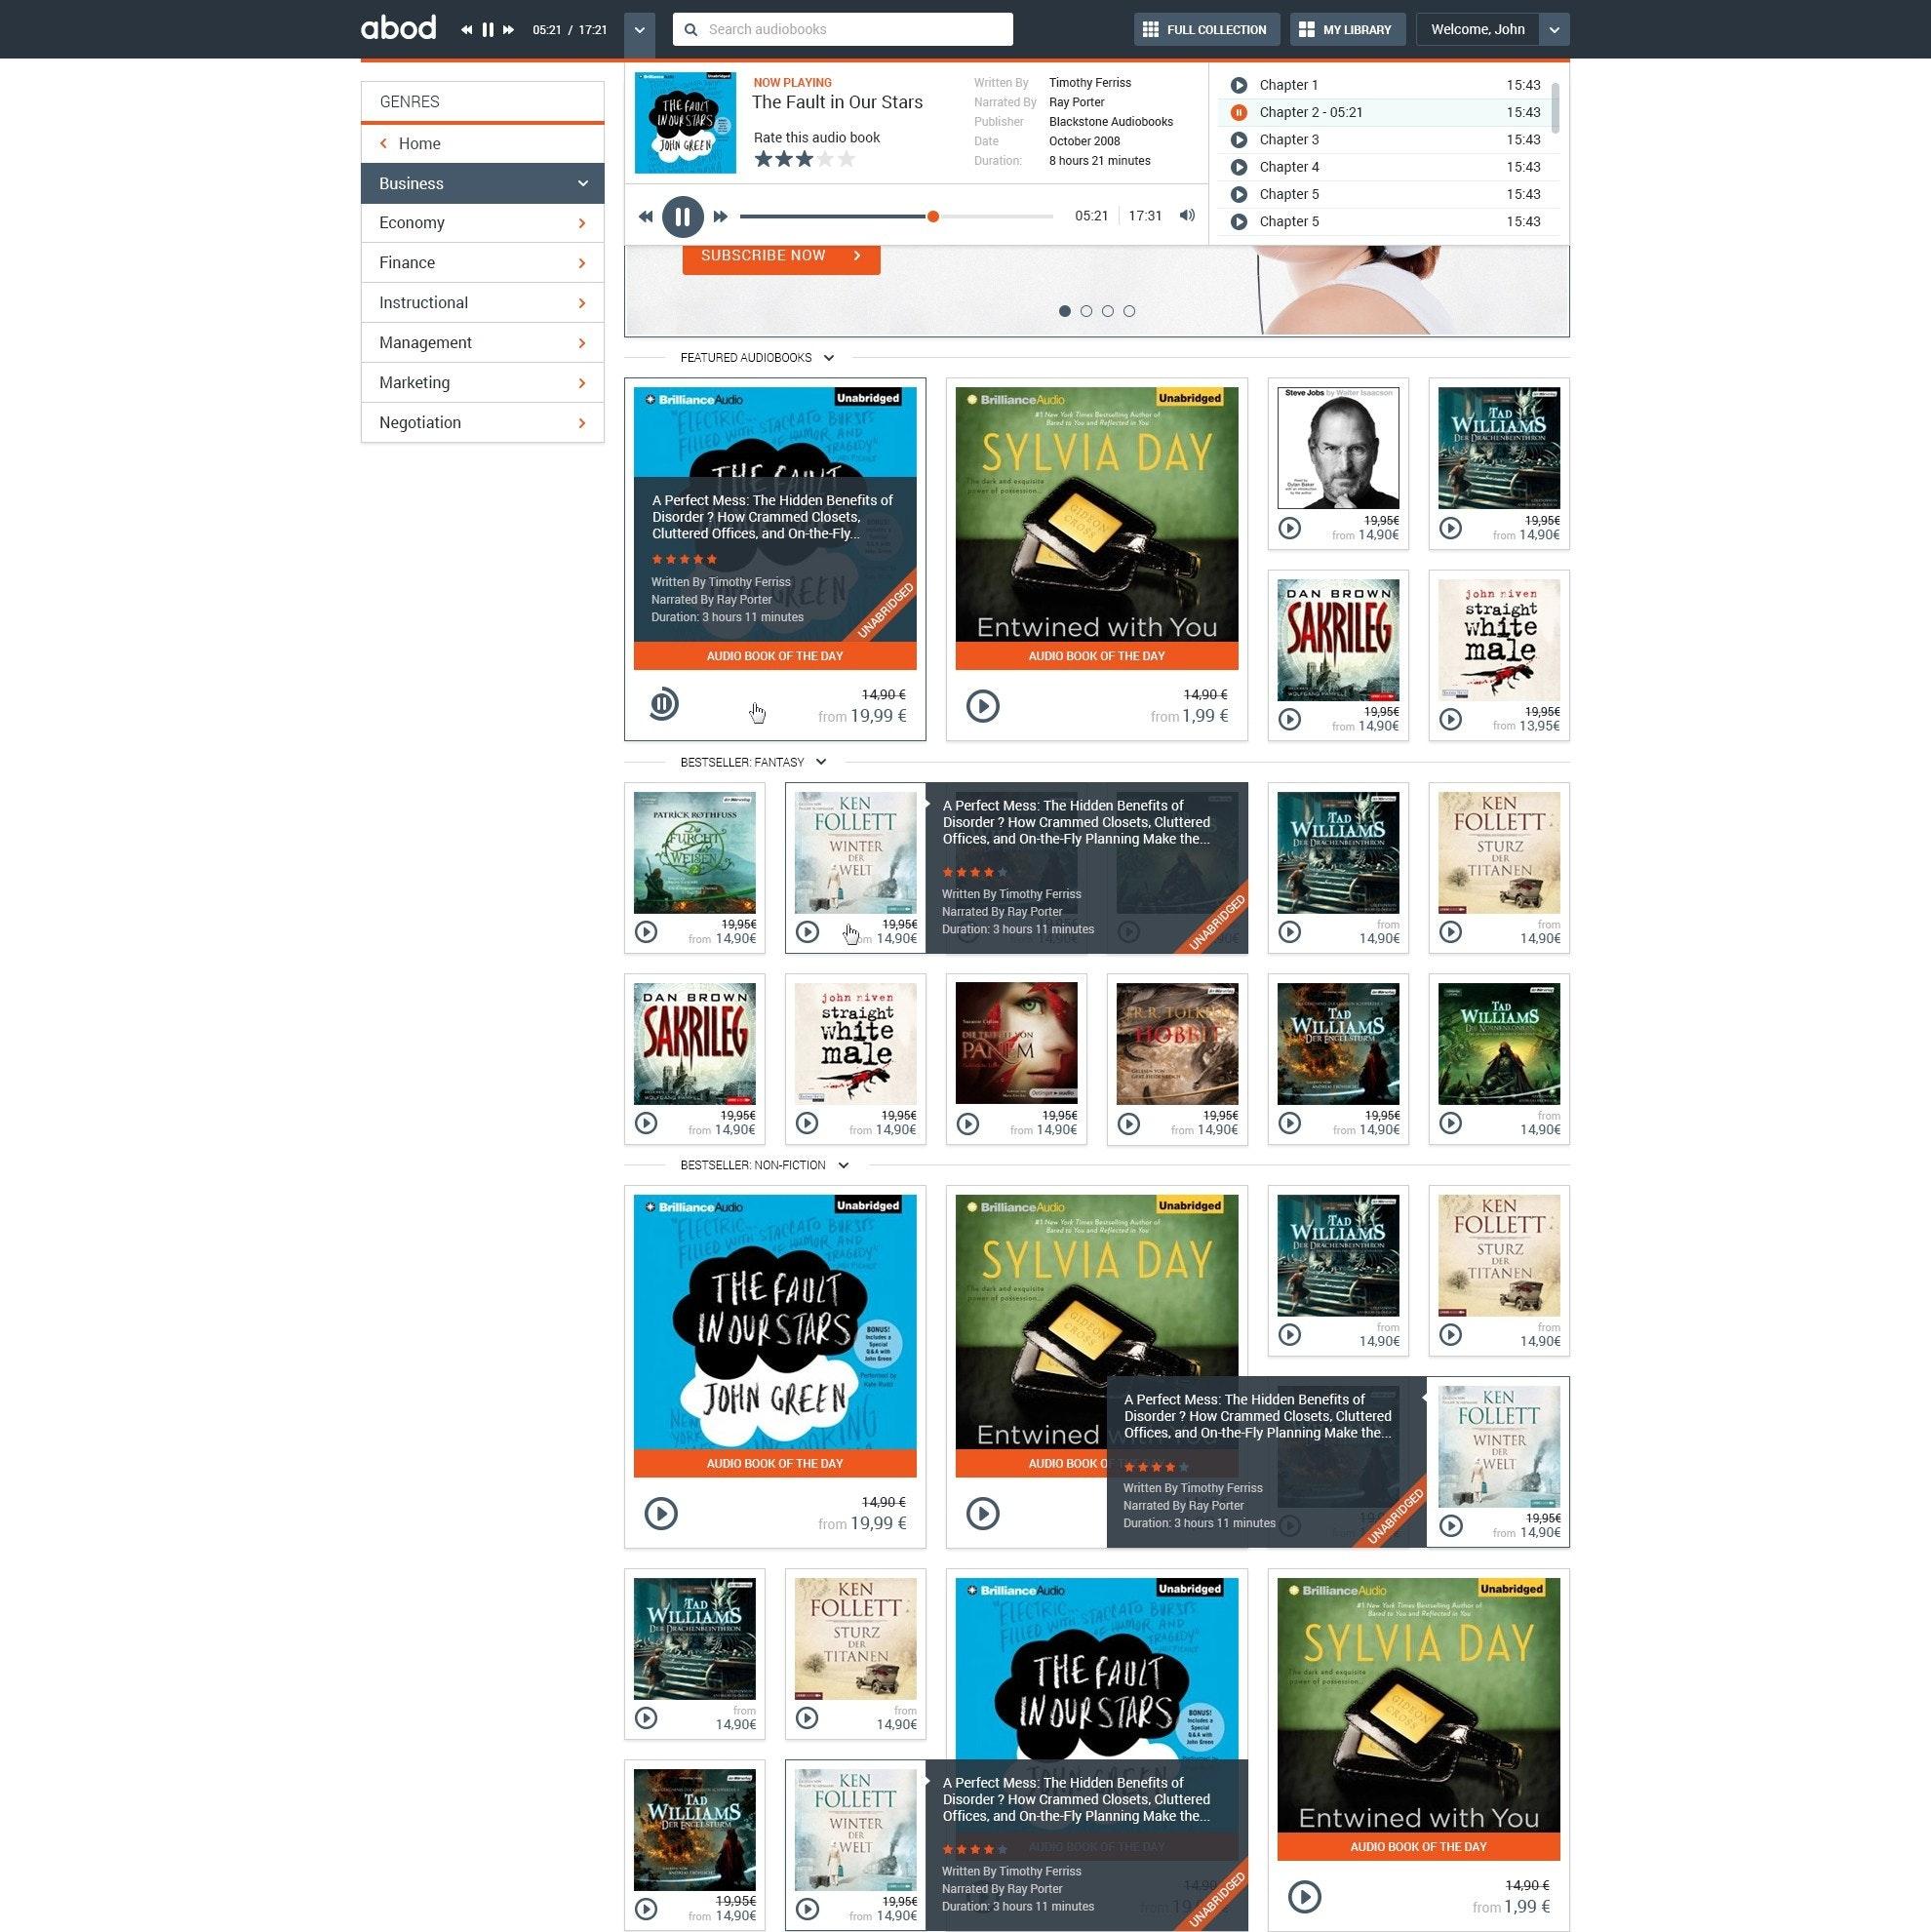 abod website design